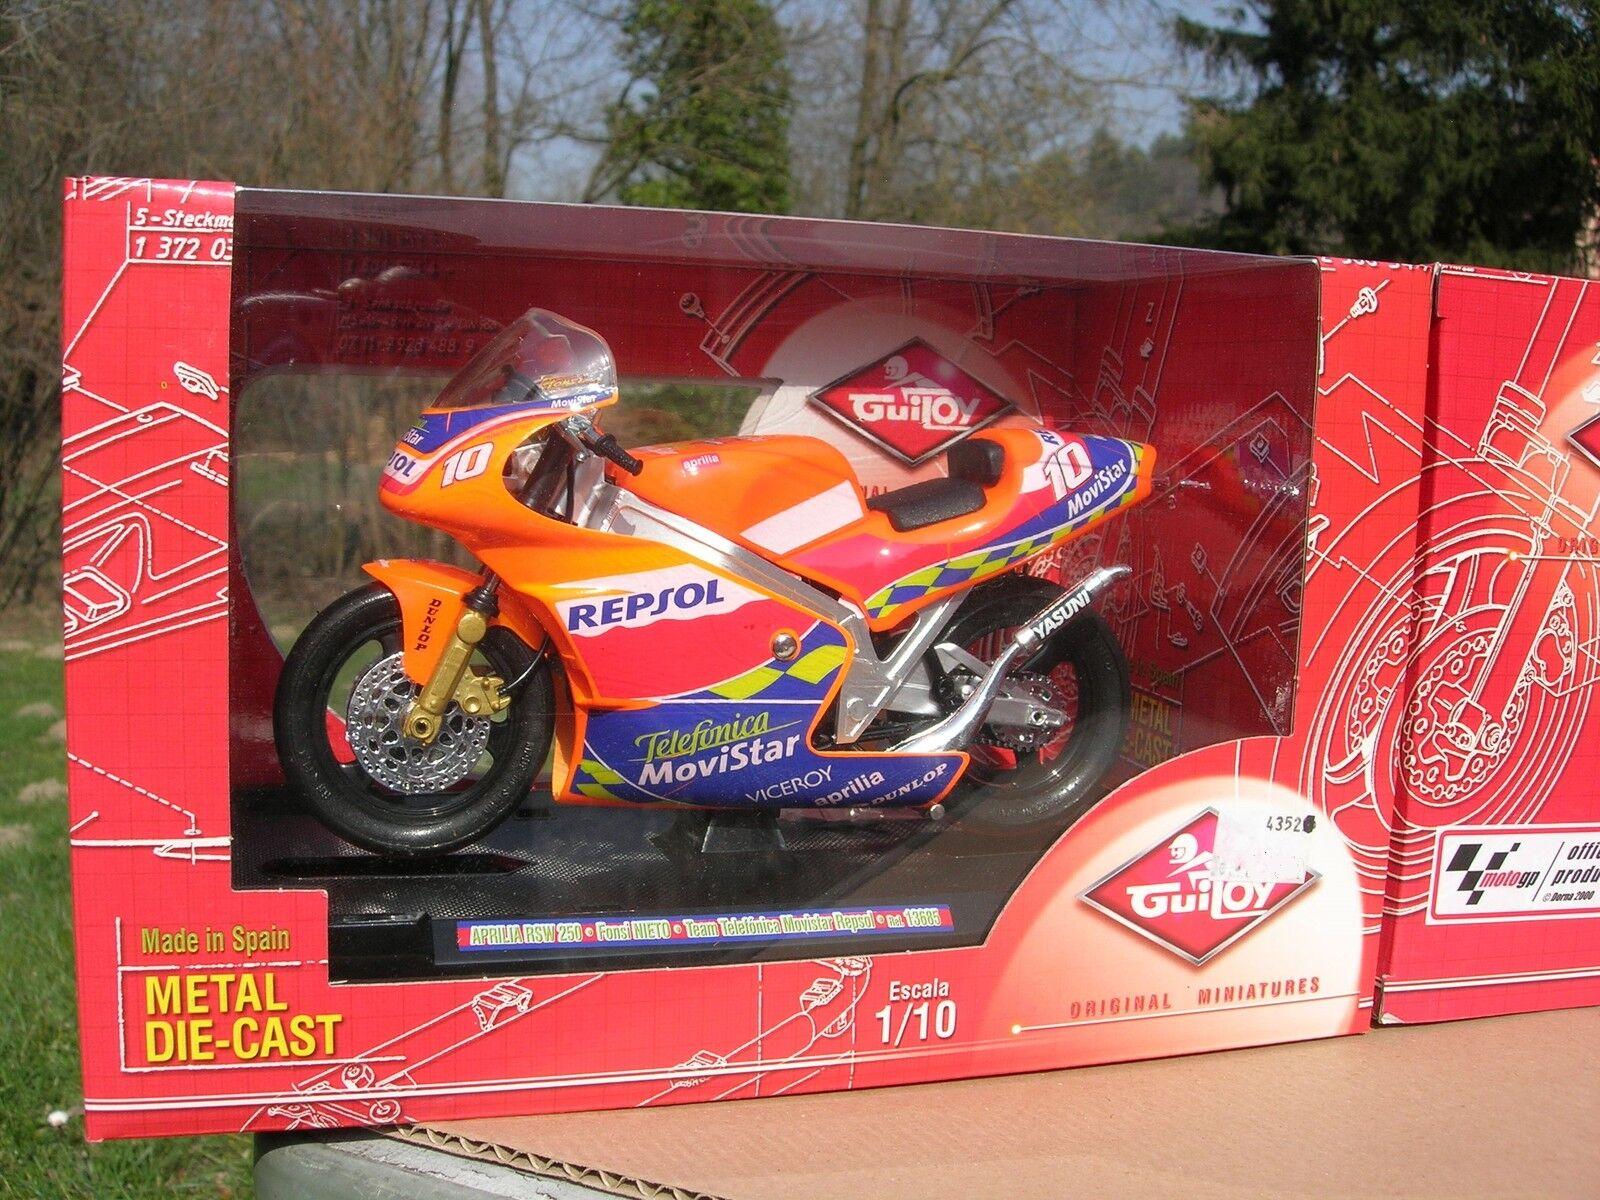 GUILOY 1 10 MOTO MOTORCYCLE APRILIA RSW 250 Fonsi NIETO TEAM REPSOL MoviIStar